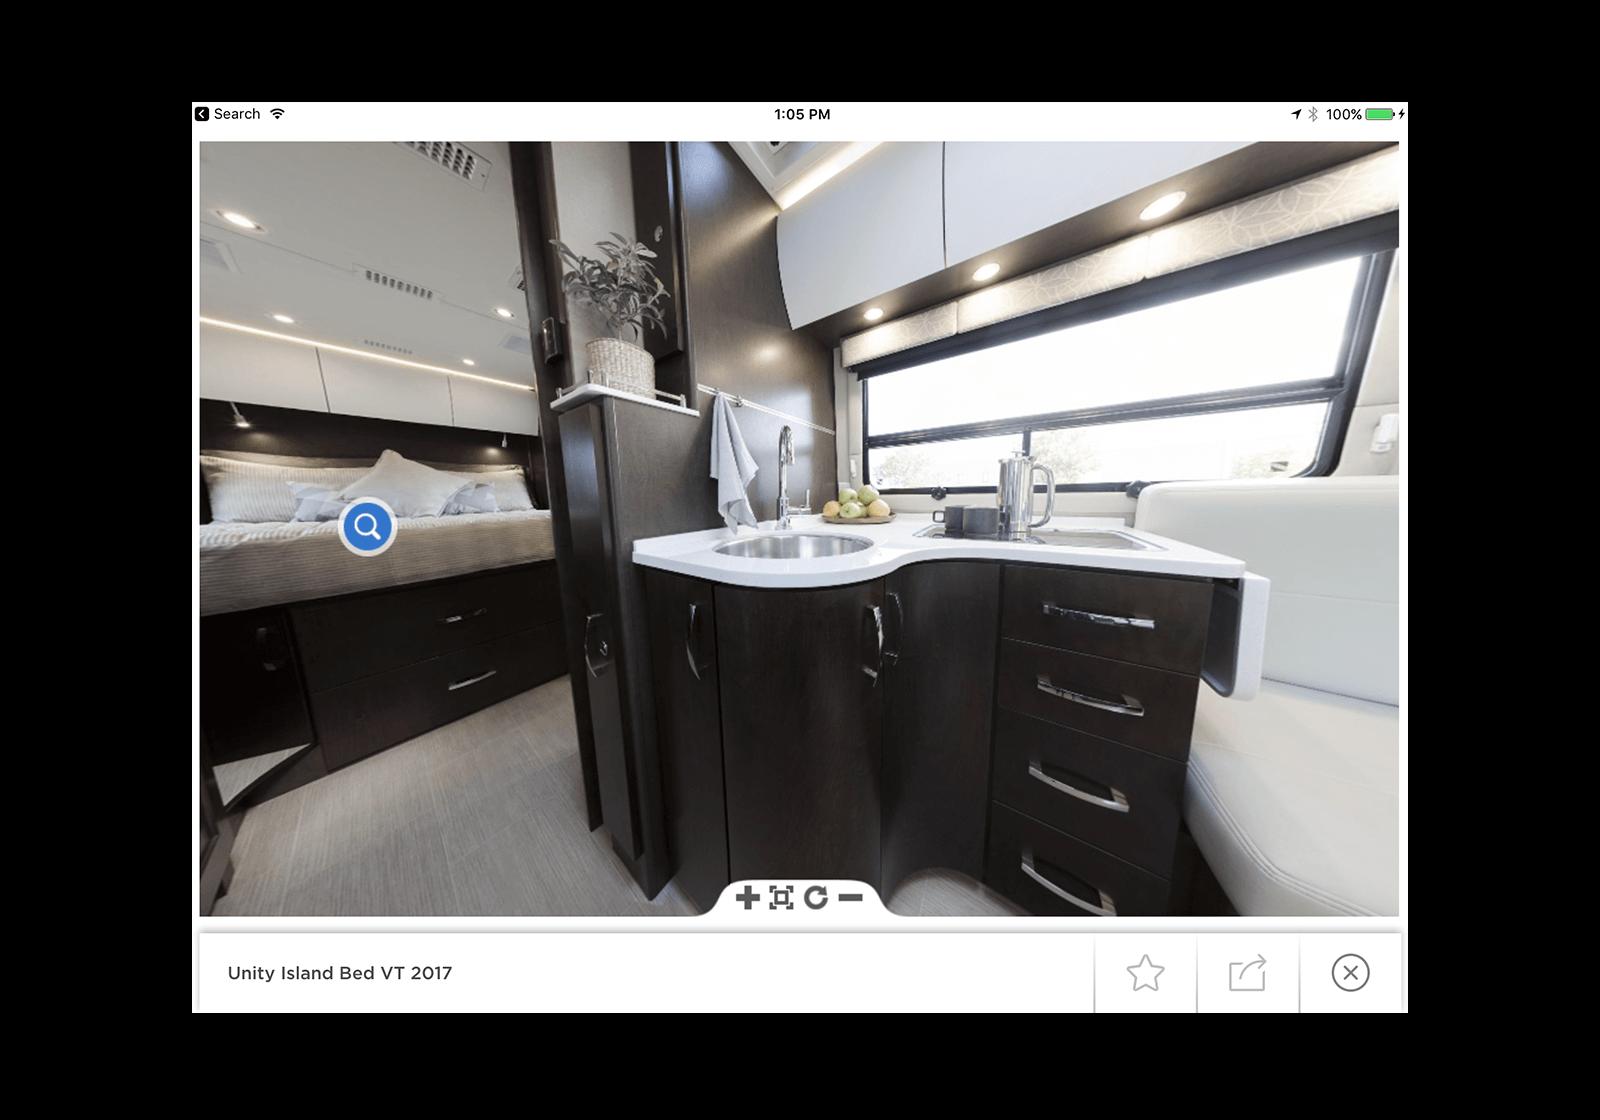 Experience a virtual tour